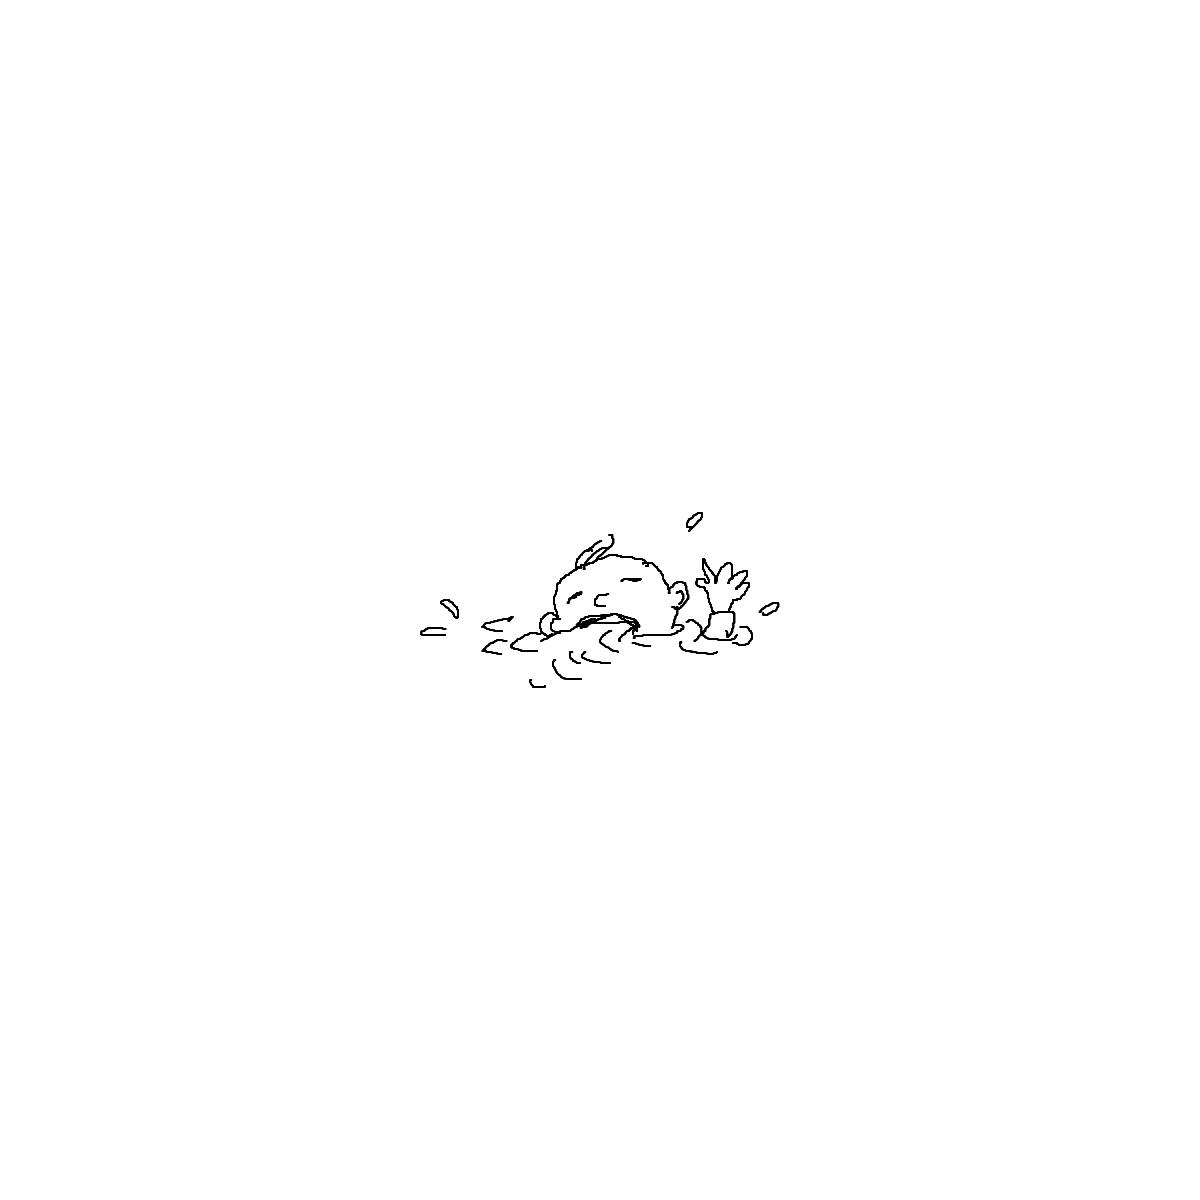 BAAAM drawing#22138 lat:78.4192352294921900lng: -4.4743223190307620